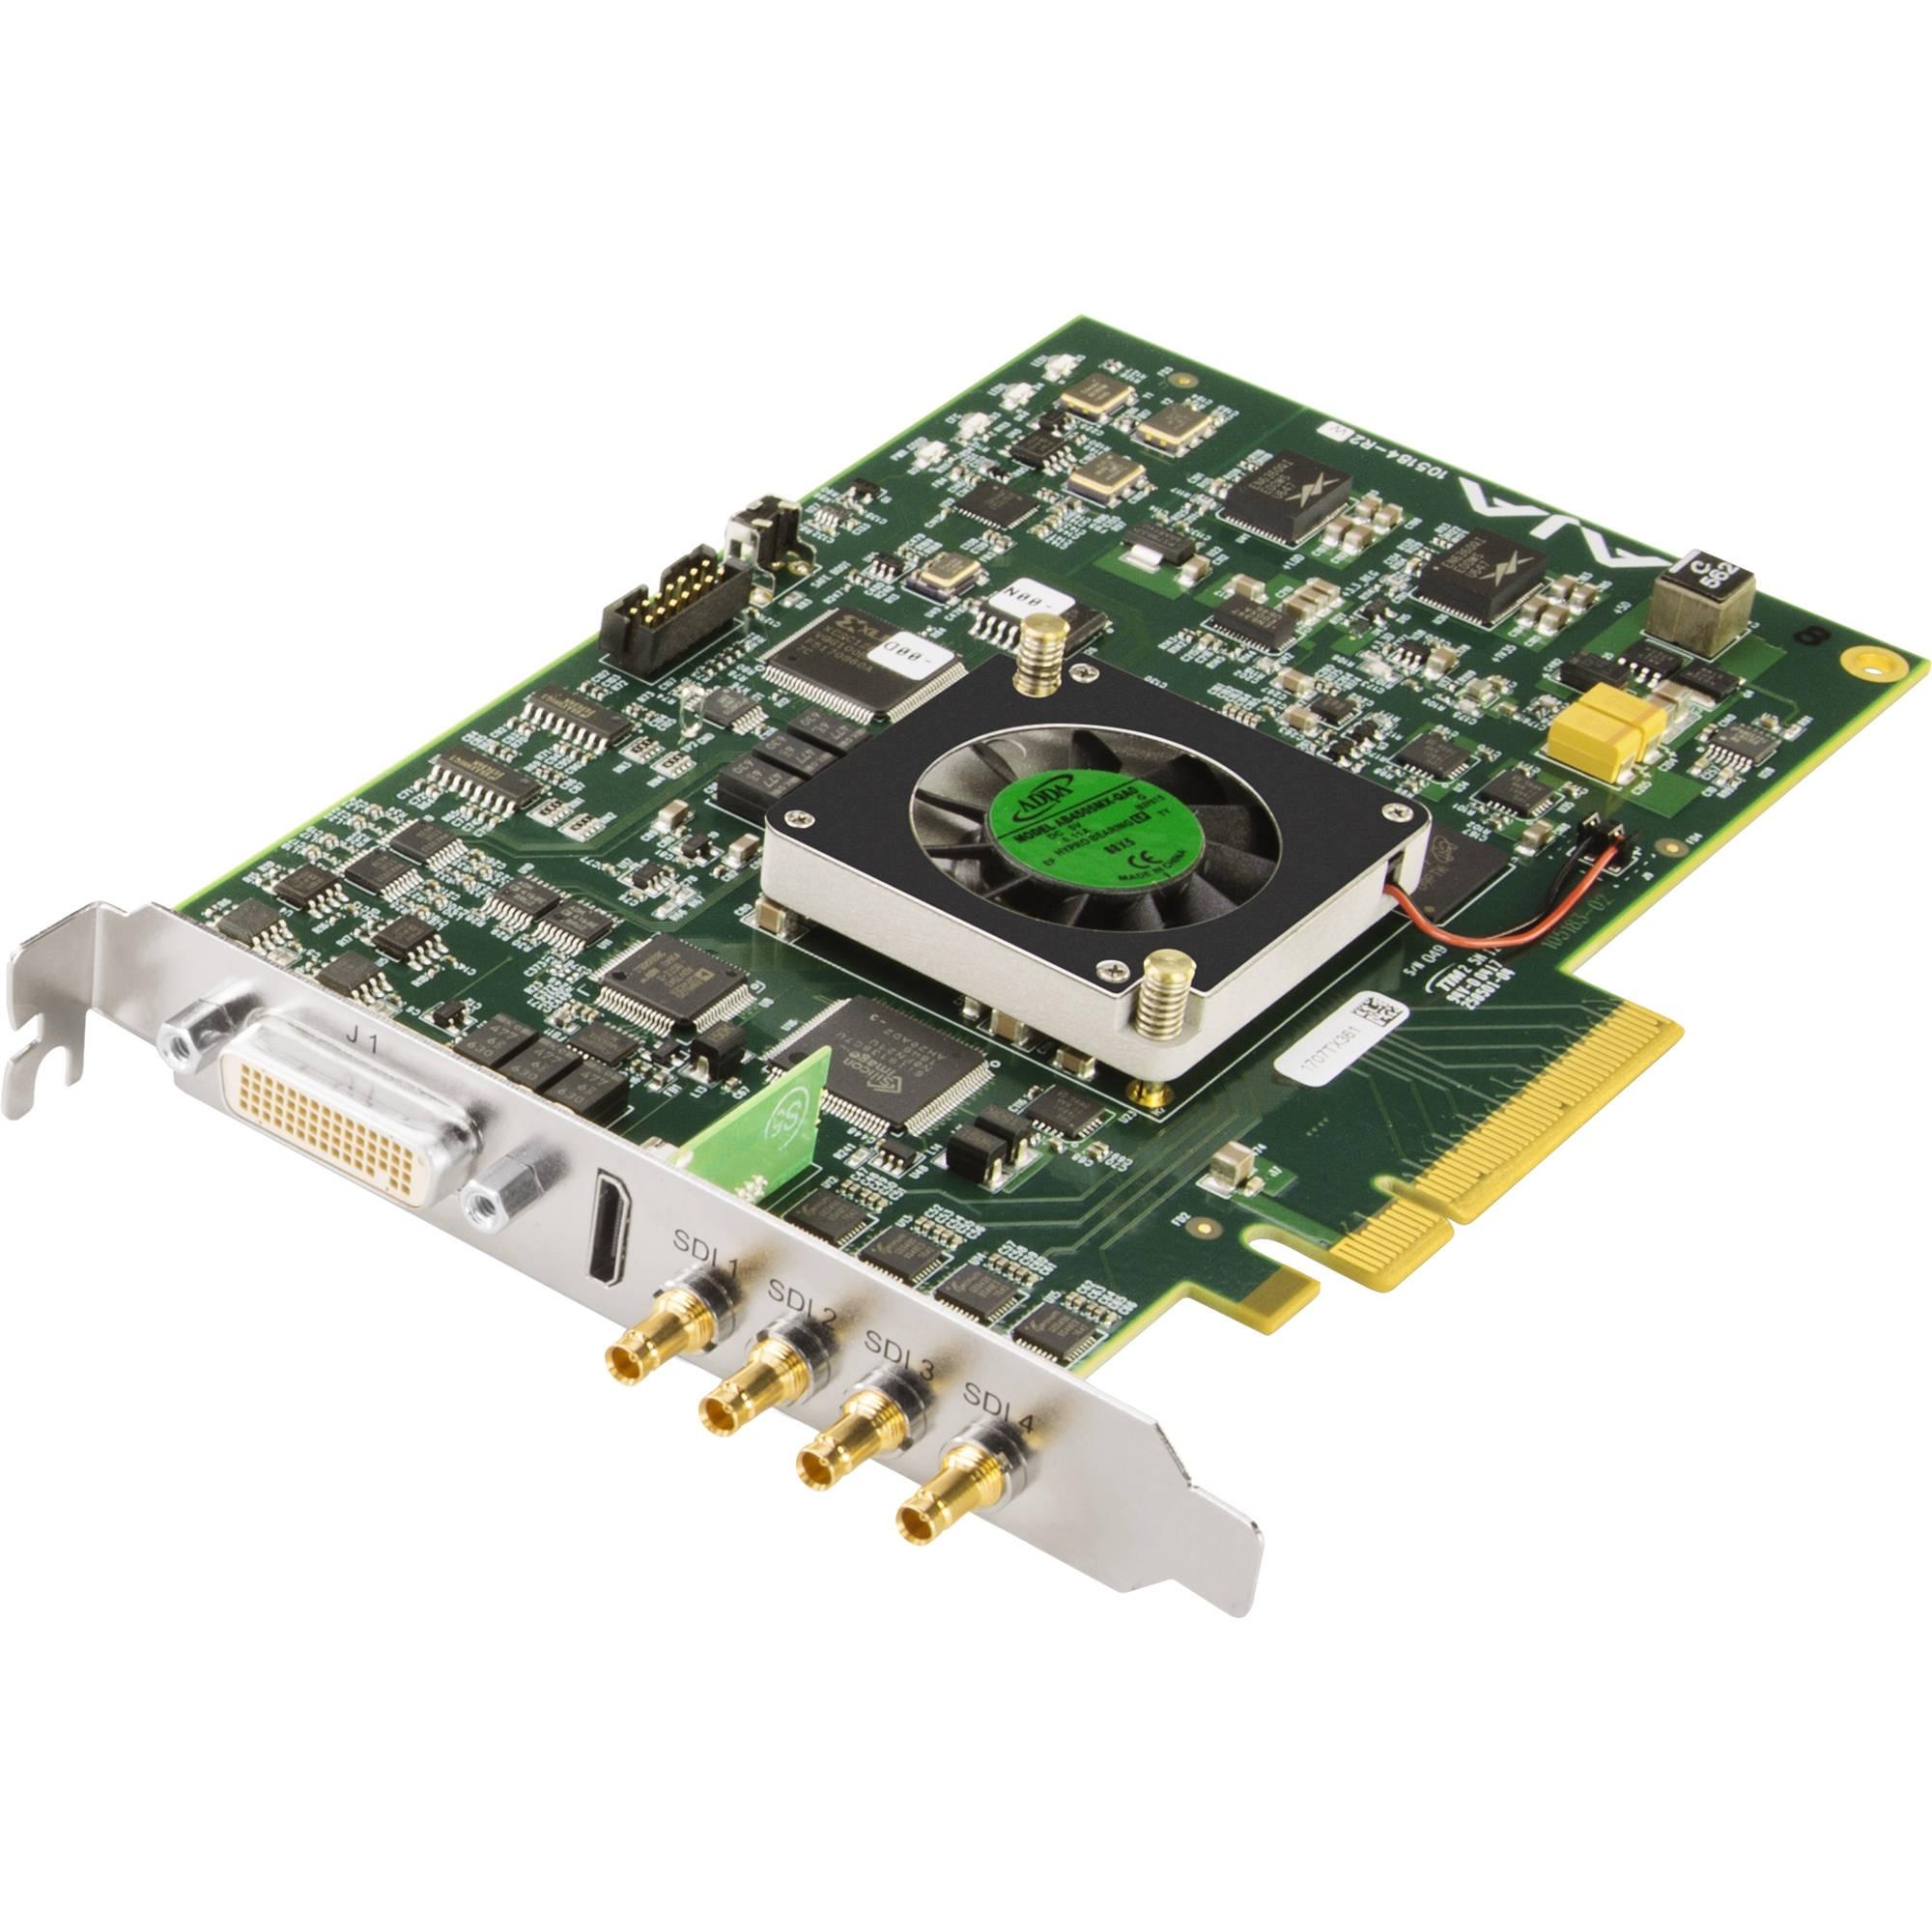 AJA KONA 4 4K/2K/3G/Dual Link/HD/SD 10-Bit PCIE Card, HDMI 1.4A Output (Bracket, Bob, 3 Cables etc.)